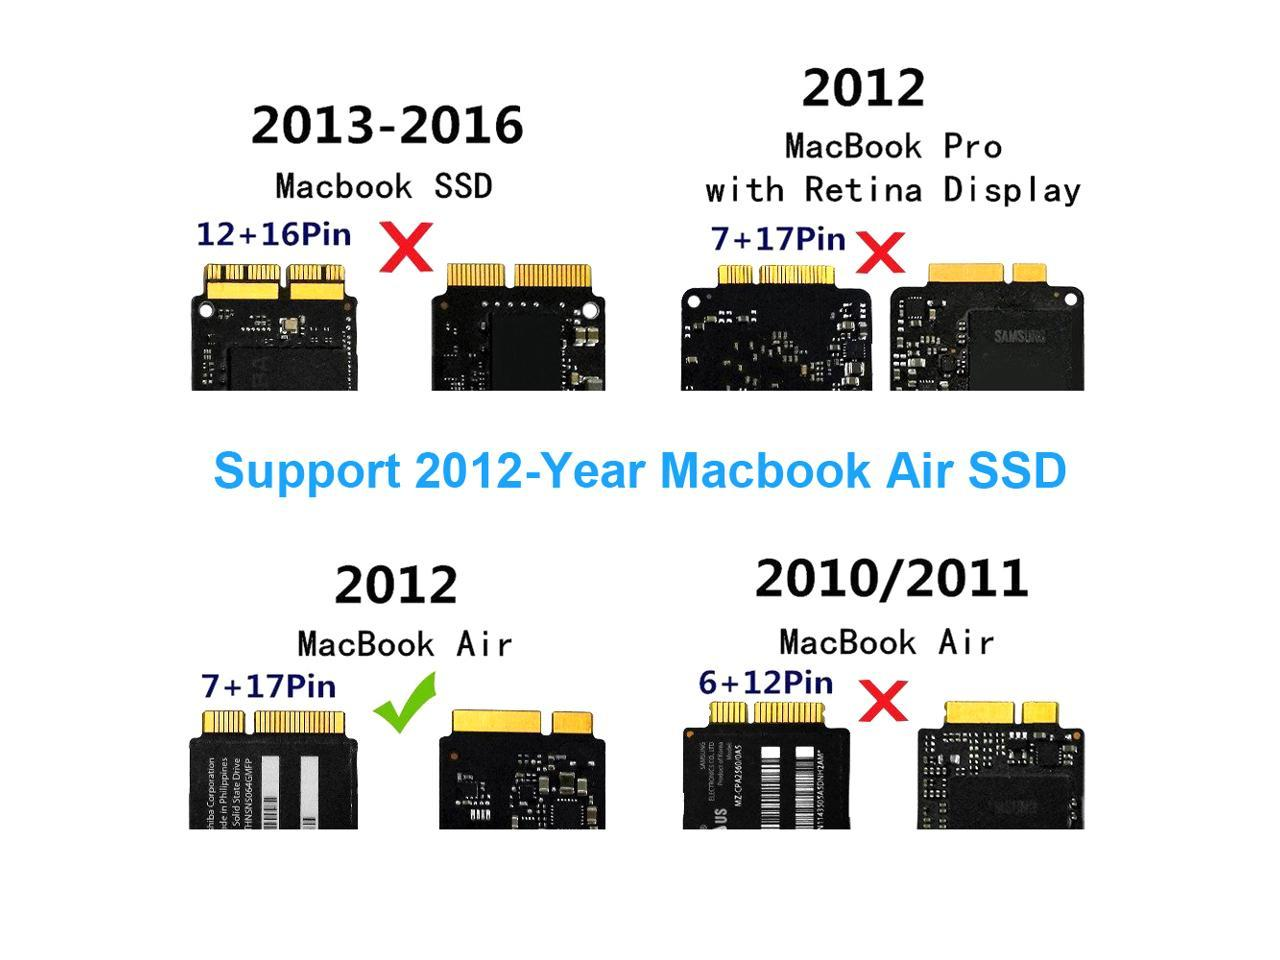 MacBookAir 2012 SSD Case,Air ssd case,usb3.0 Interface,Very Small,JZLL M+2